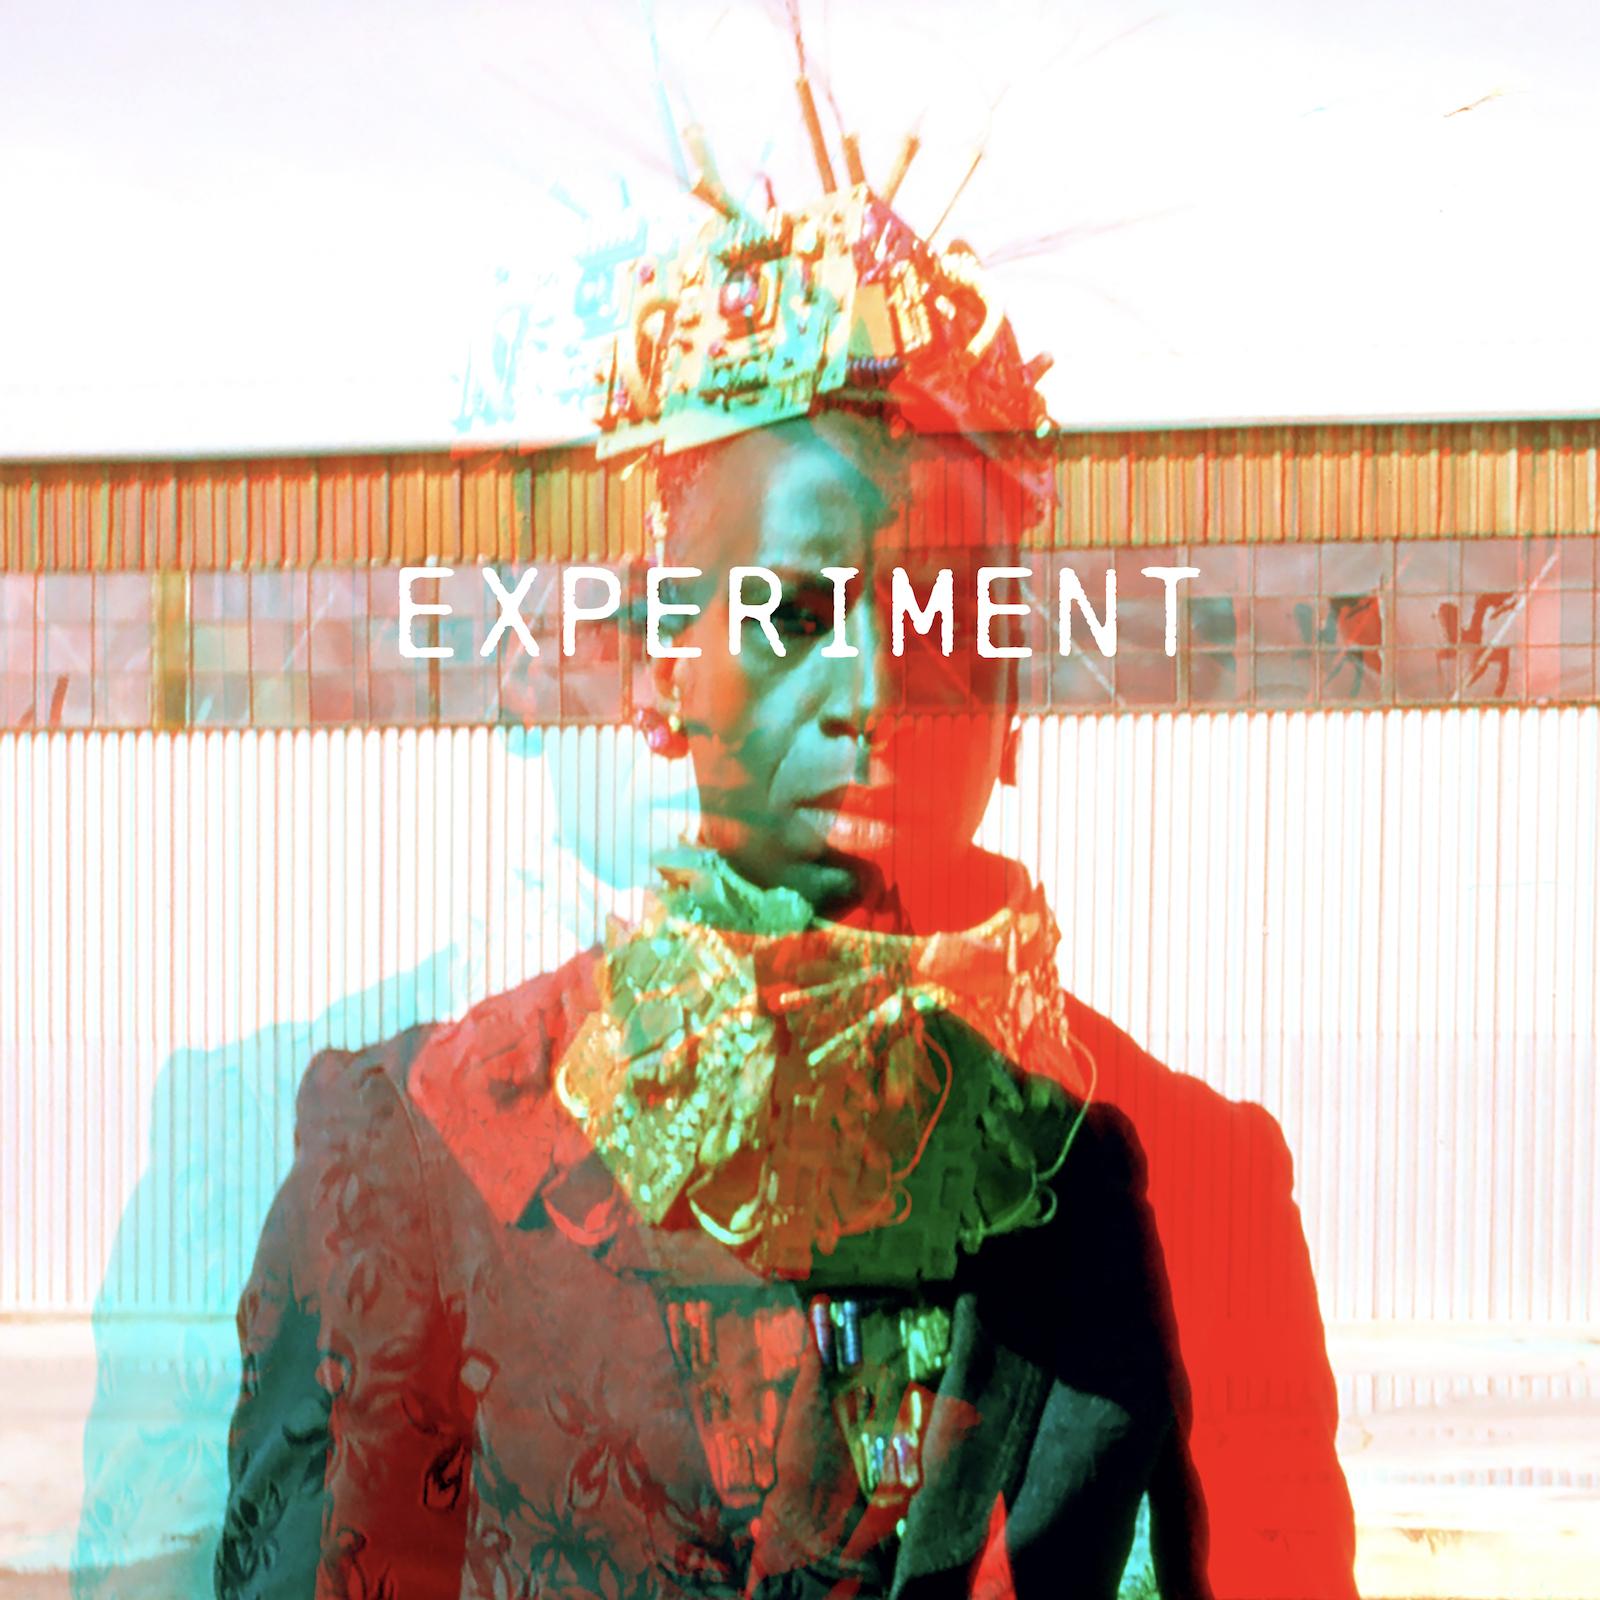 saul-williams-experiment.jpg